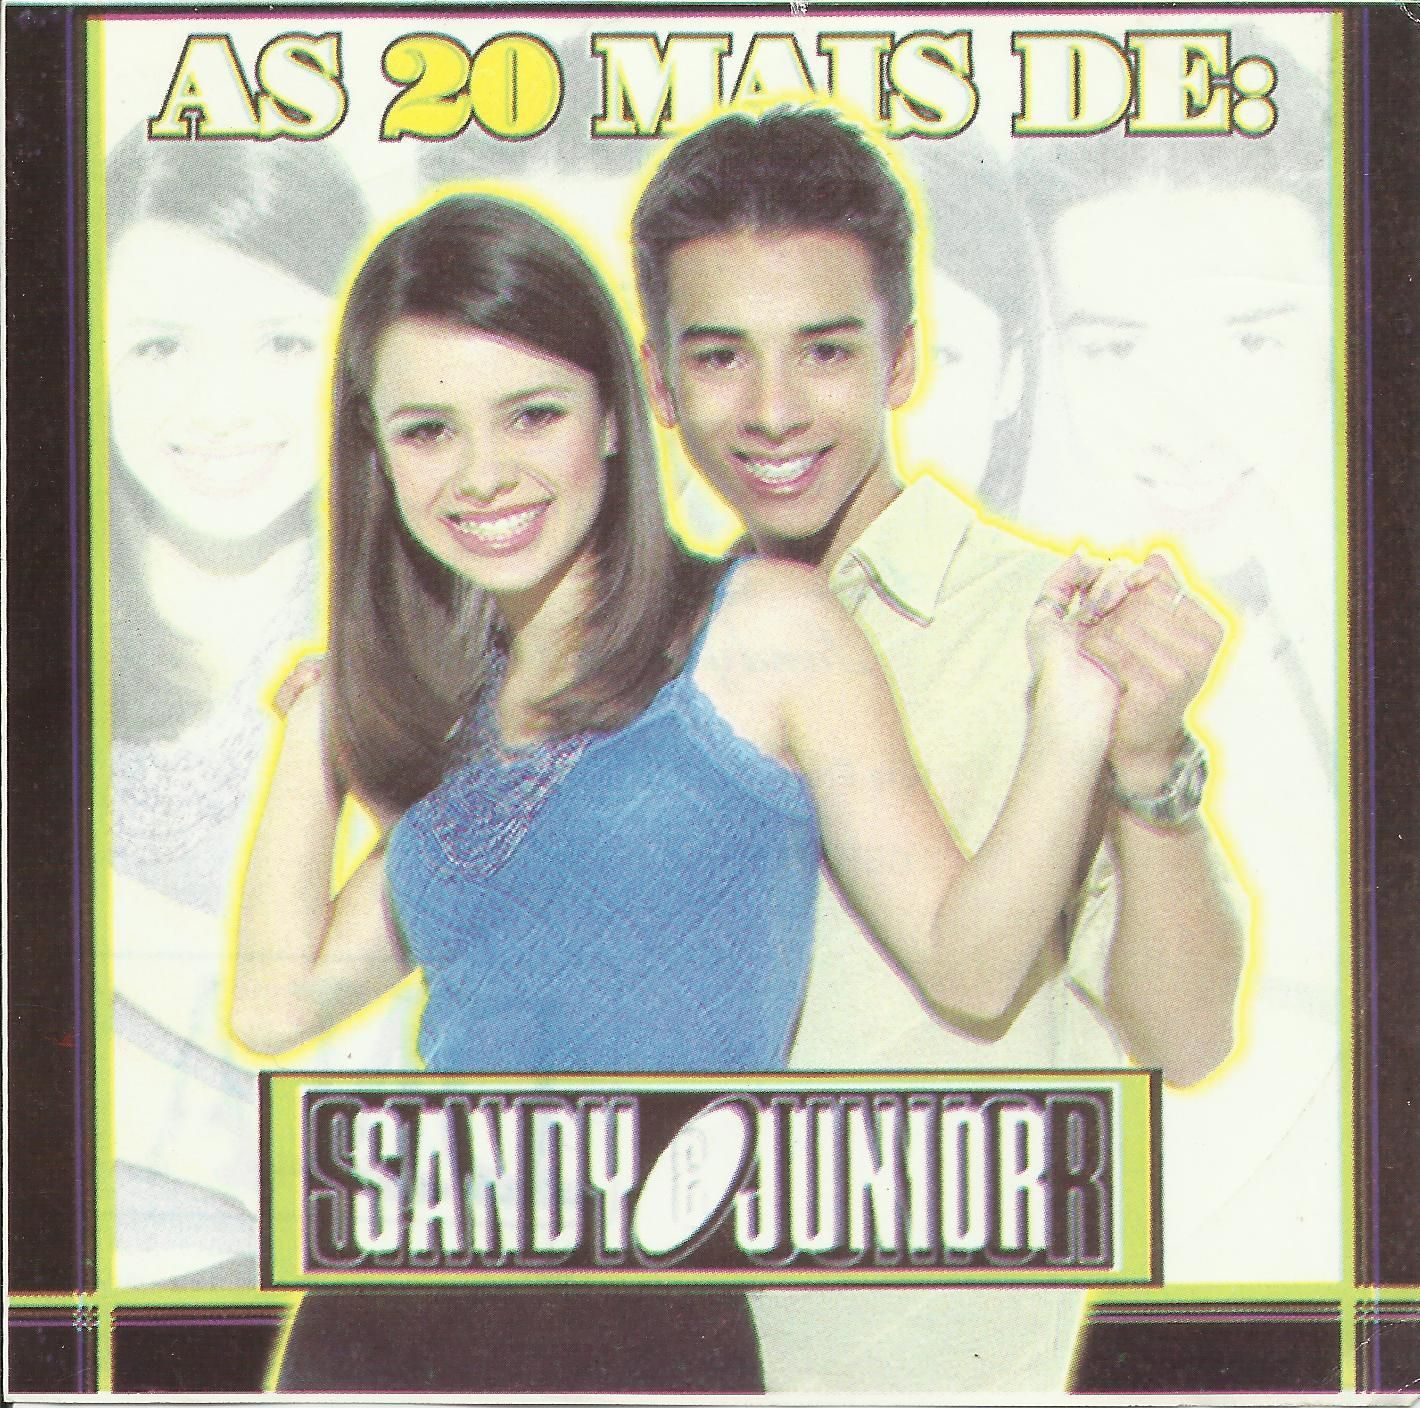 CD SANDY MUSICAS BAIXAR MANUSCRITO